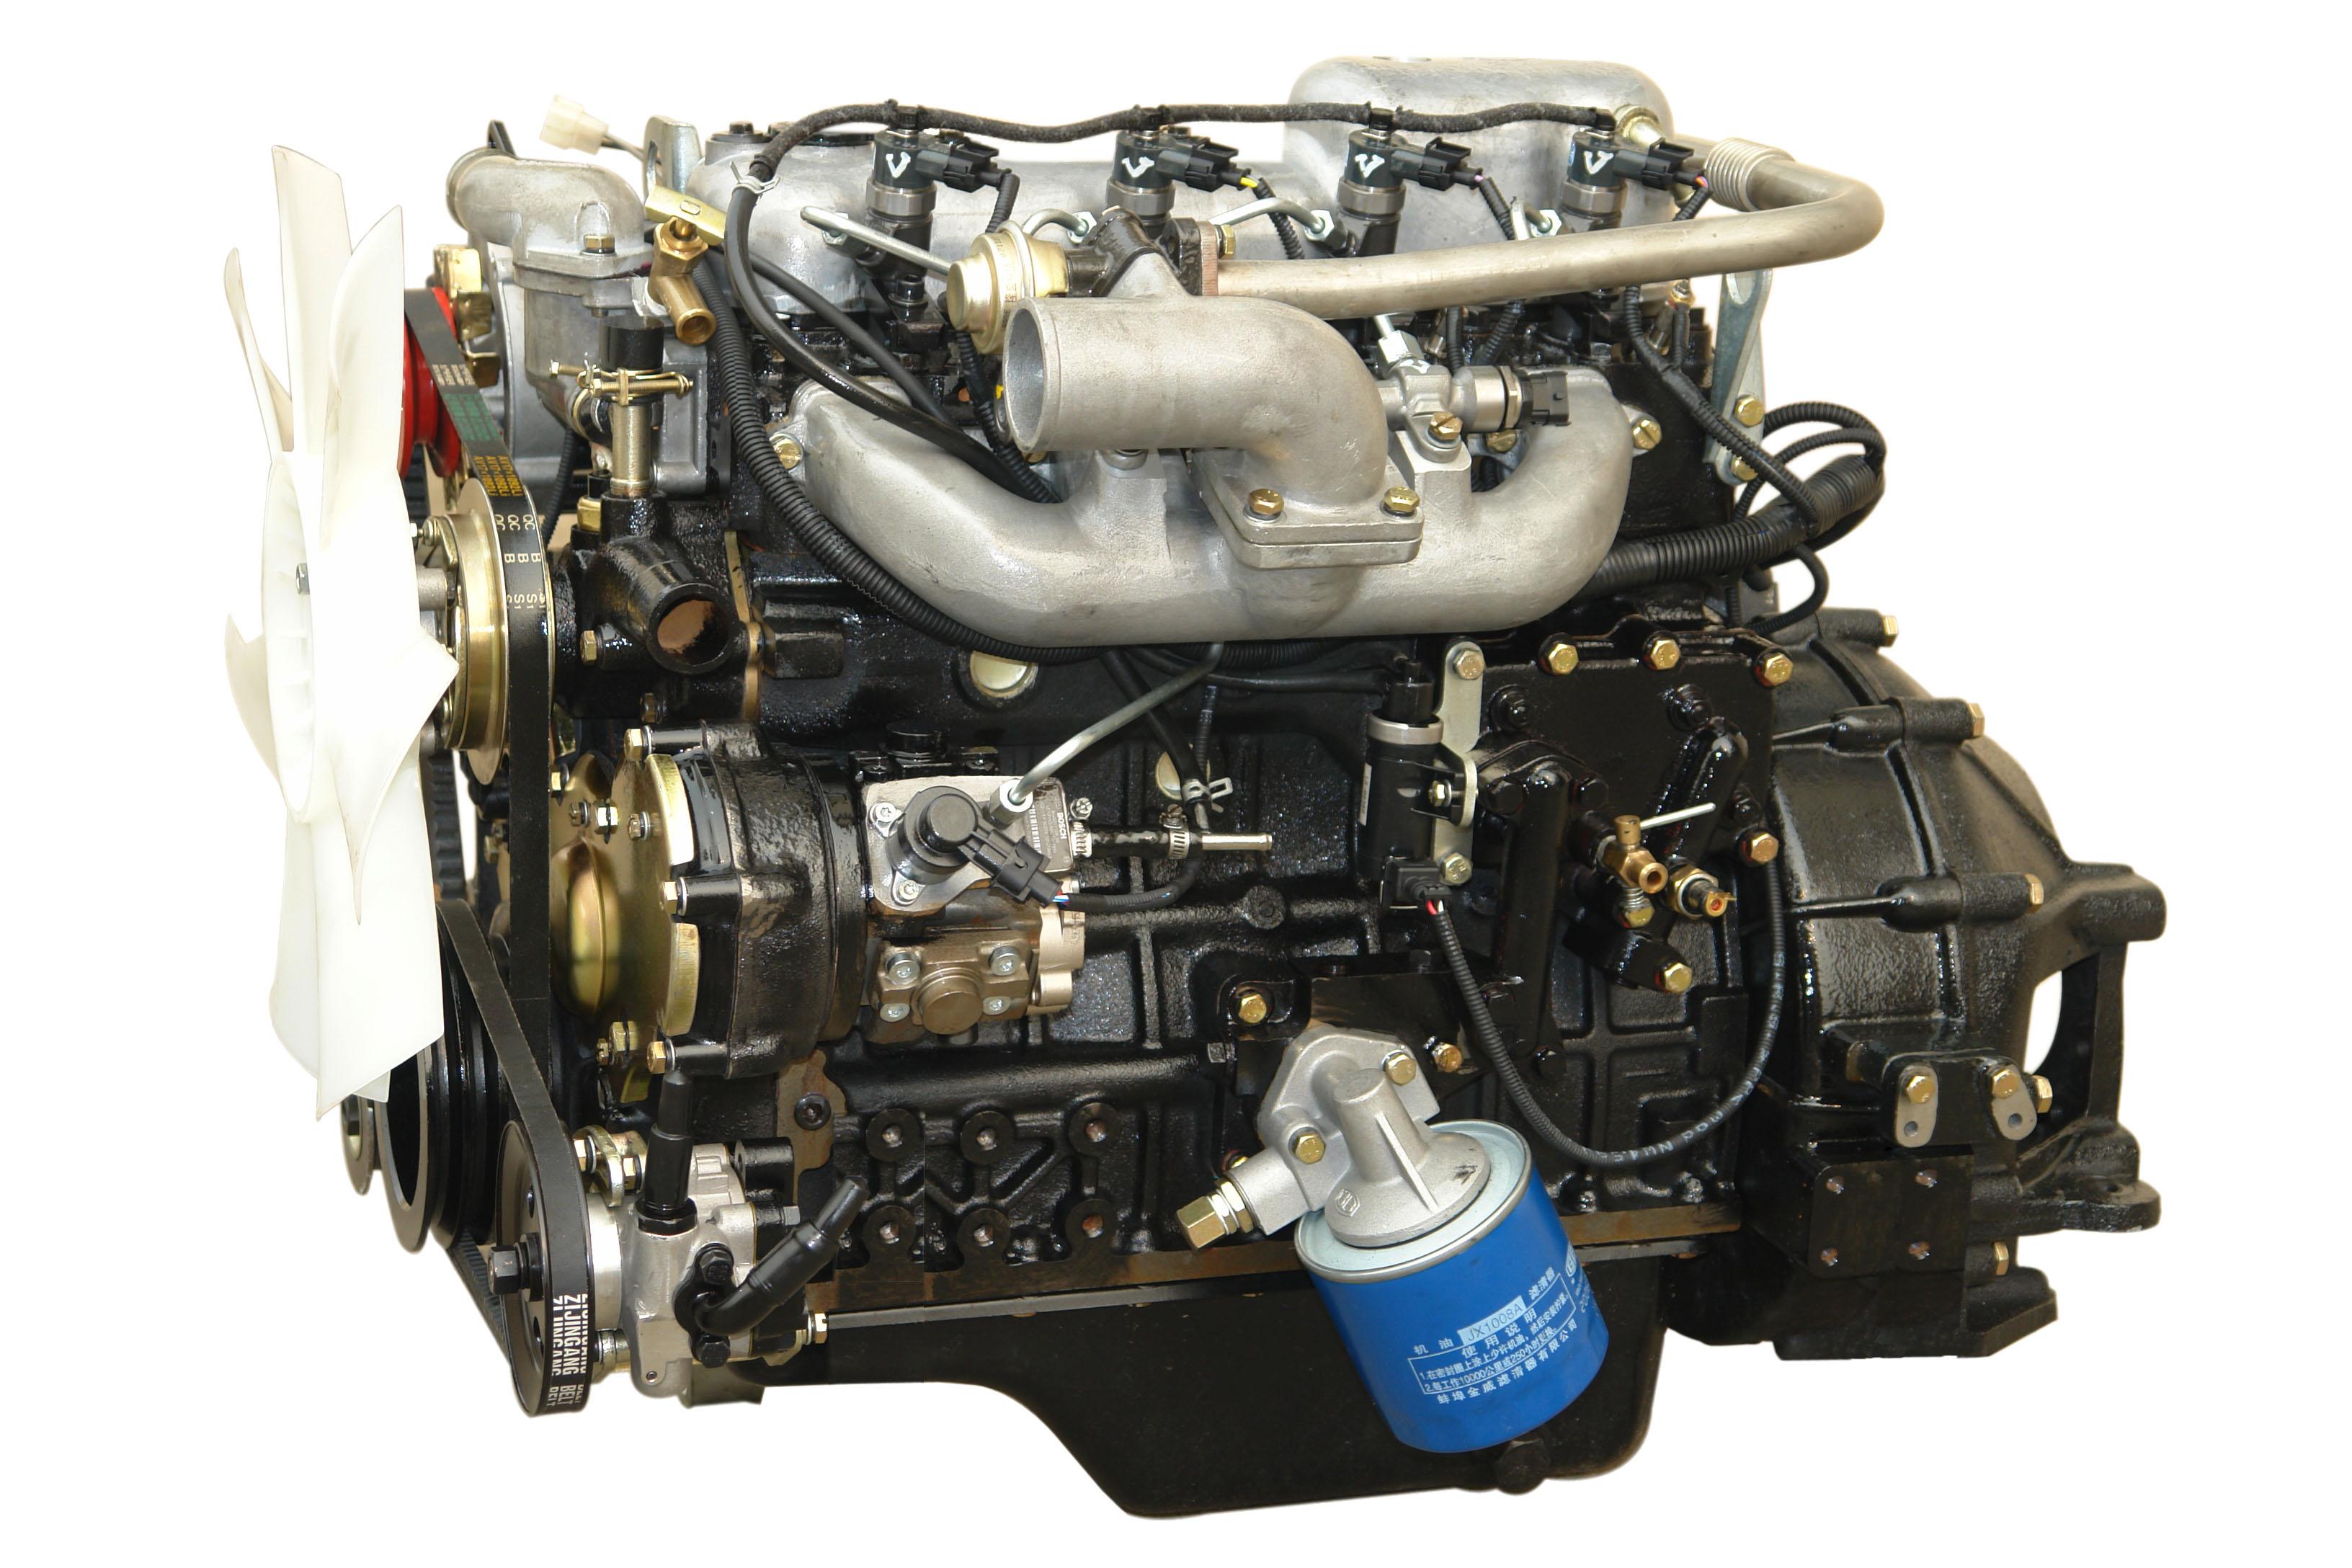 QC485柴油机供应商|质量好的QC485柴油机在哪能买到